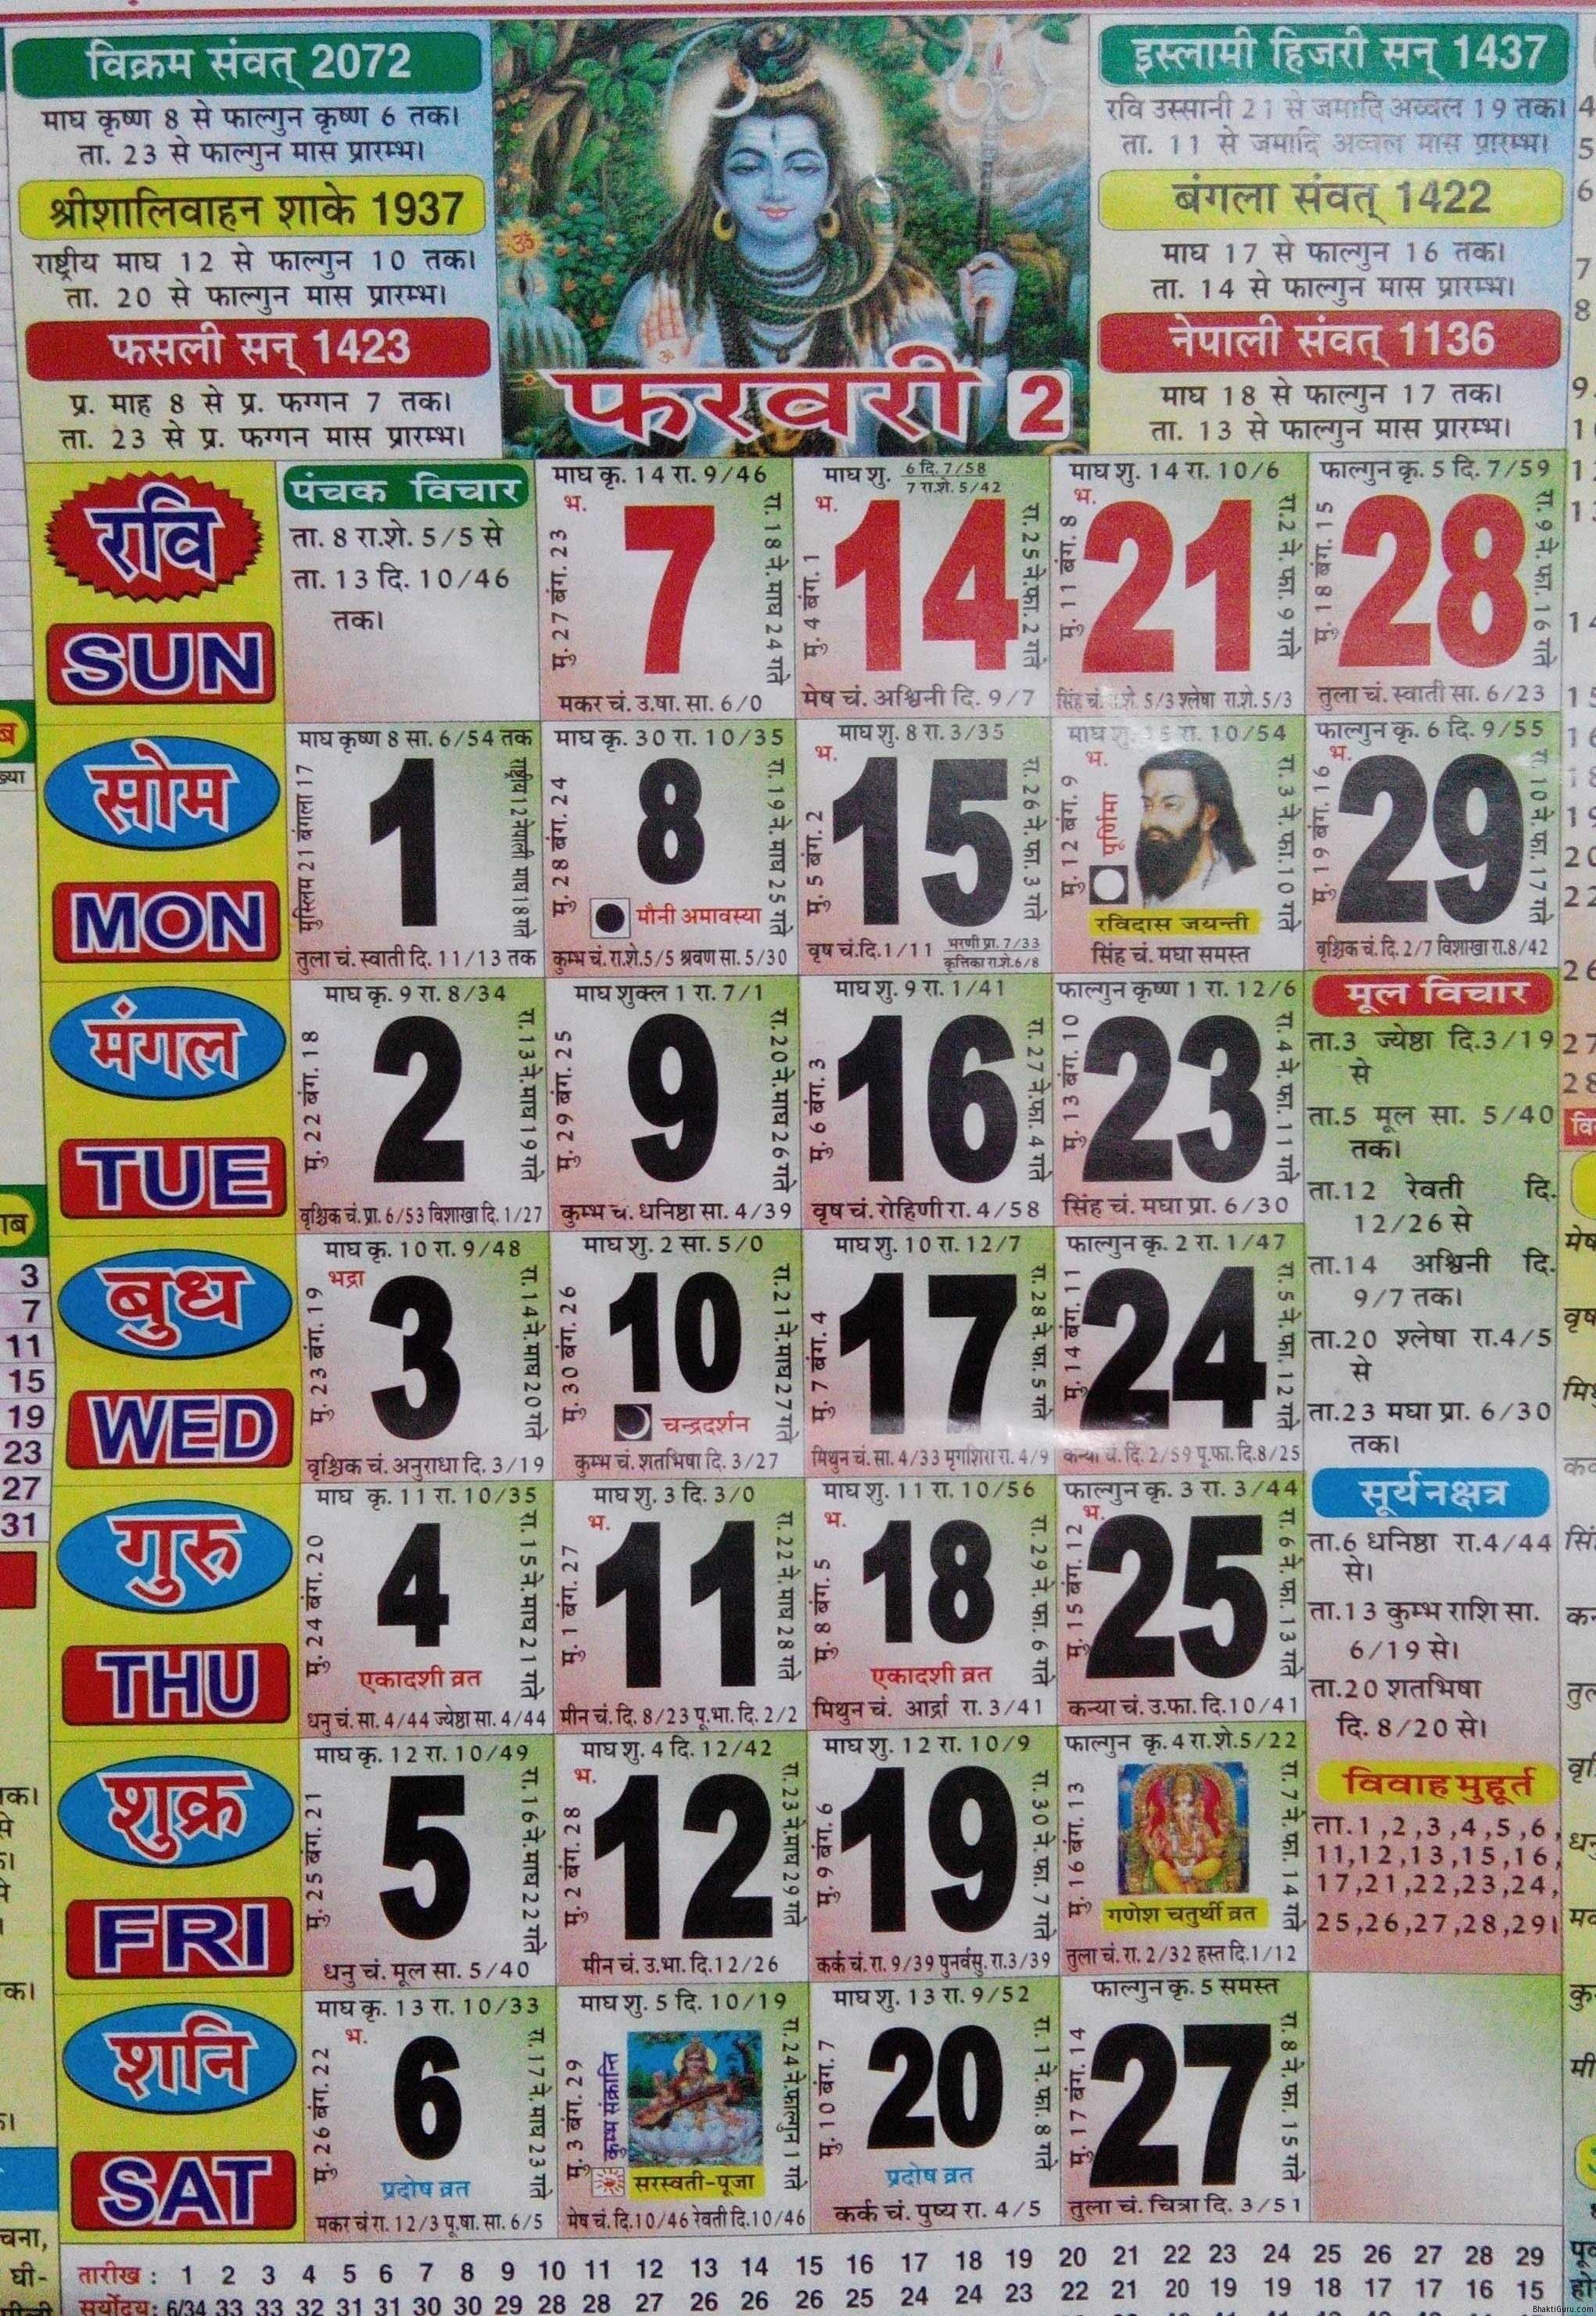 Gujarati Calendar 2019 Printable With Holidays With Hindu Calendar Calendar 2019 Gujarati